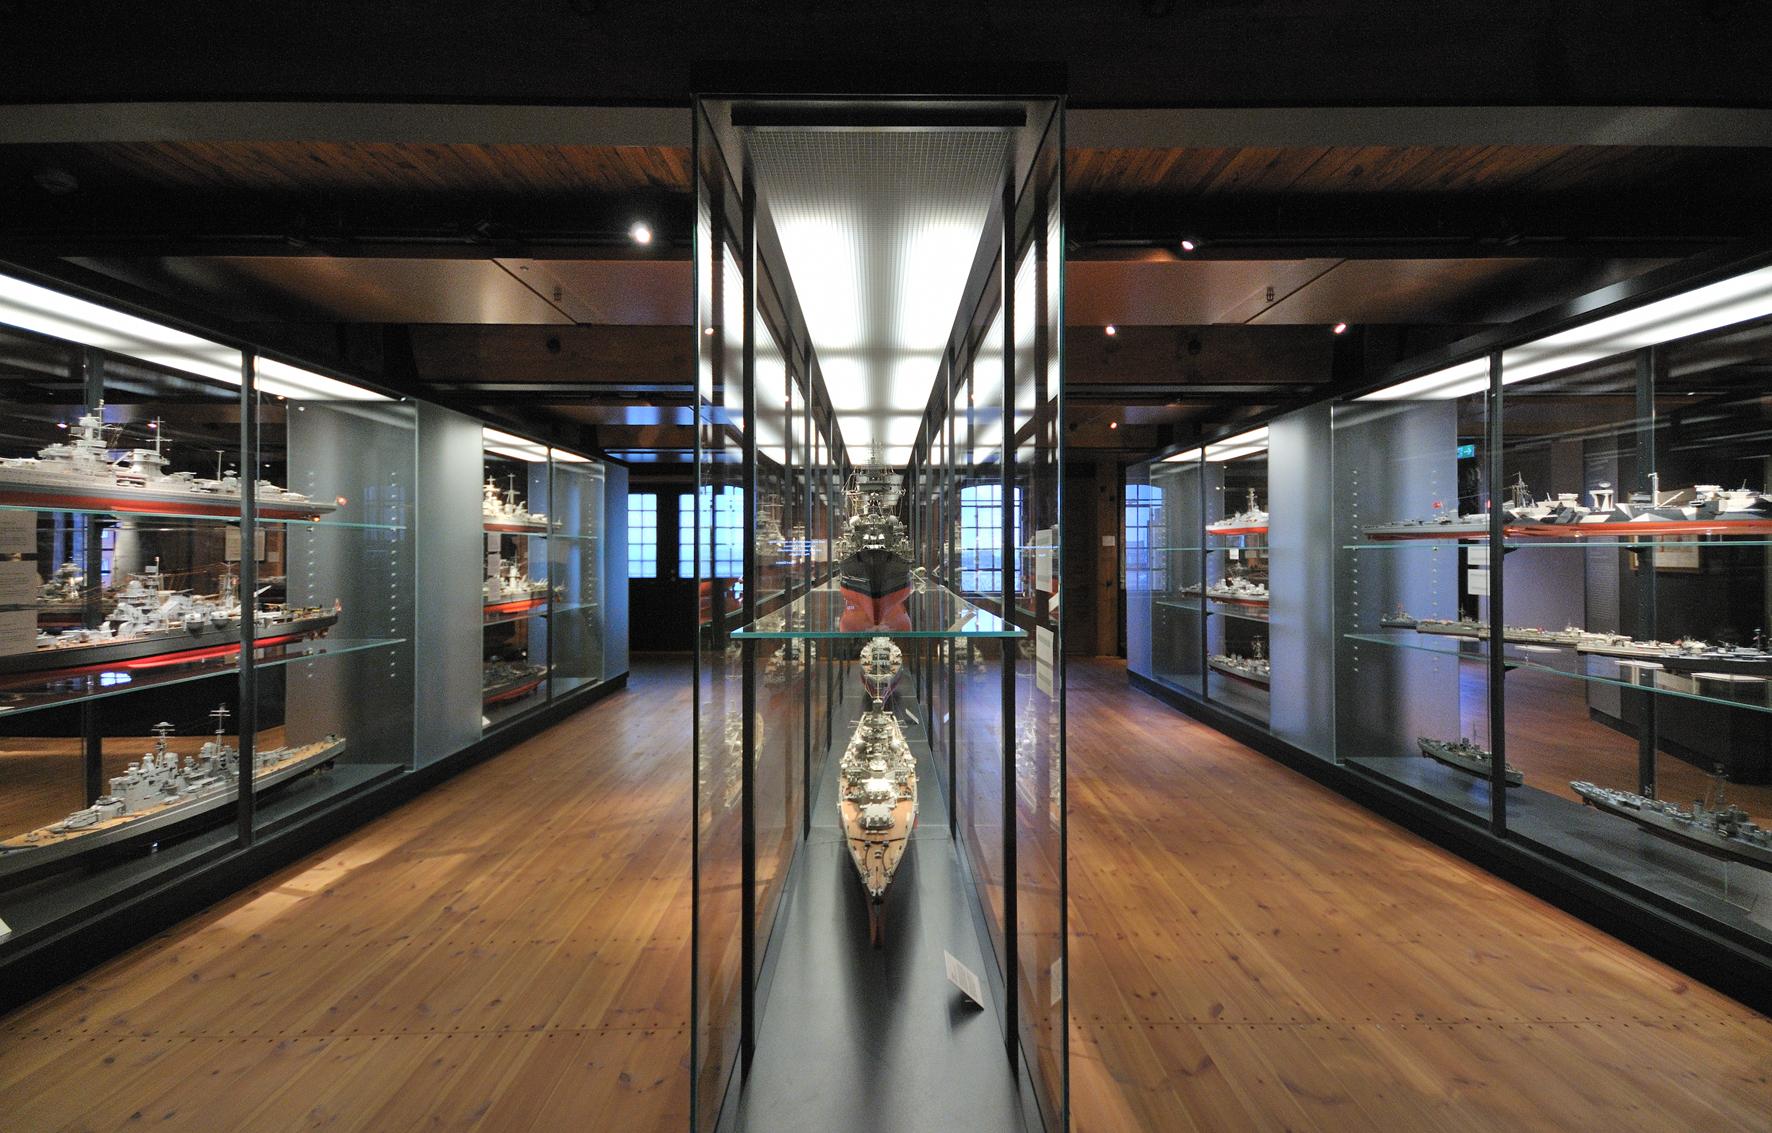 14.kwod_Ausstellung_Internationales_Maritimes_Museum.Kriegsschiffe